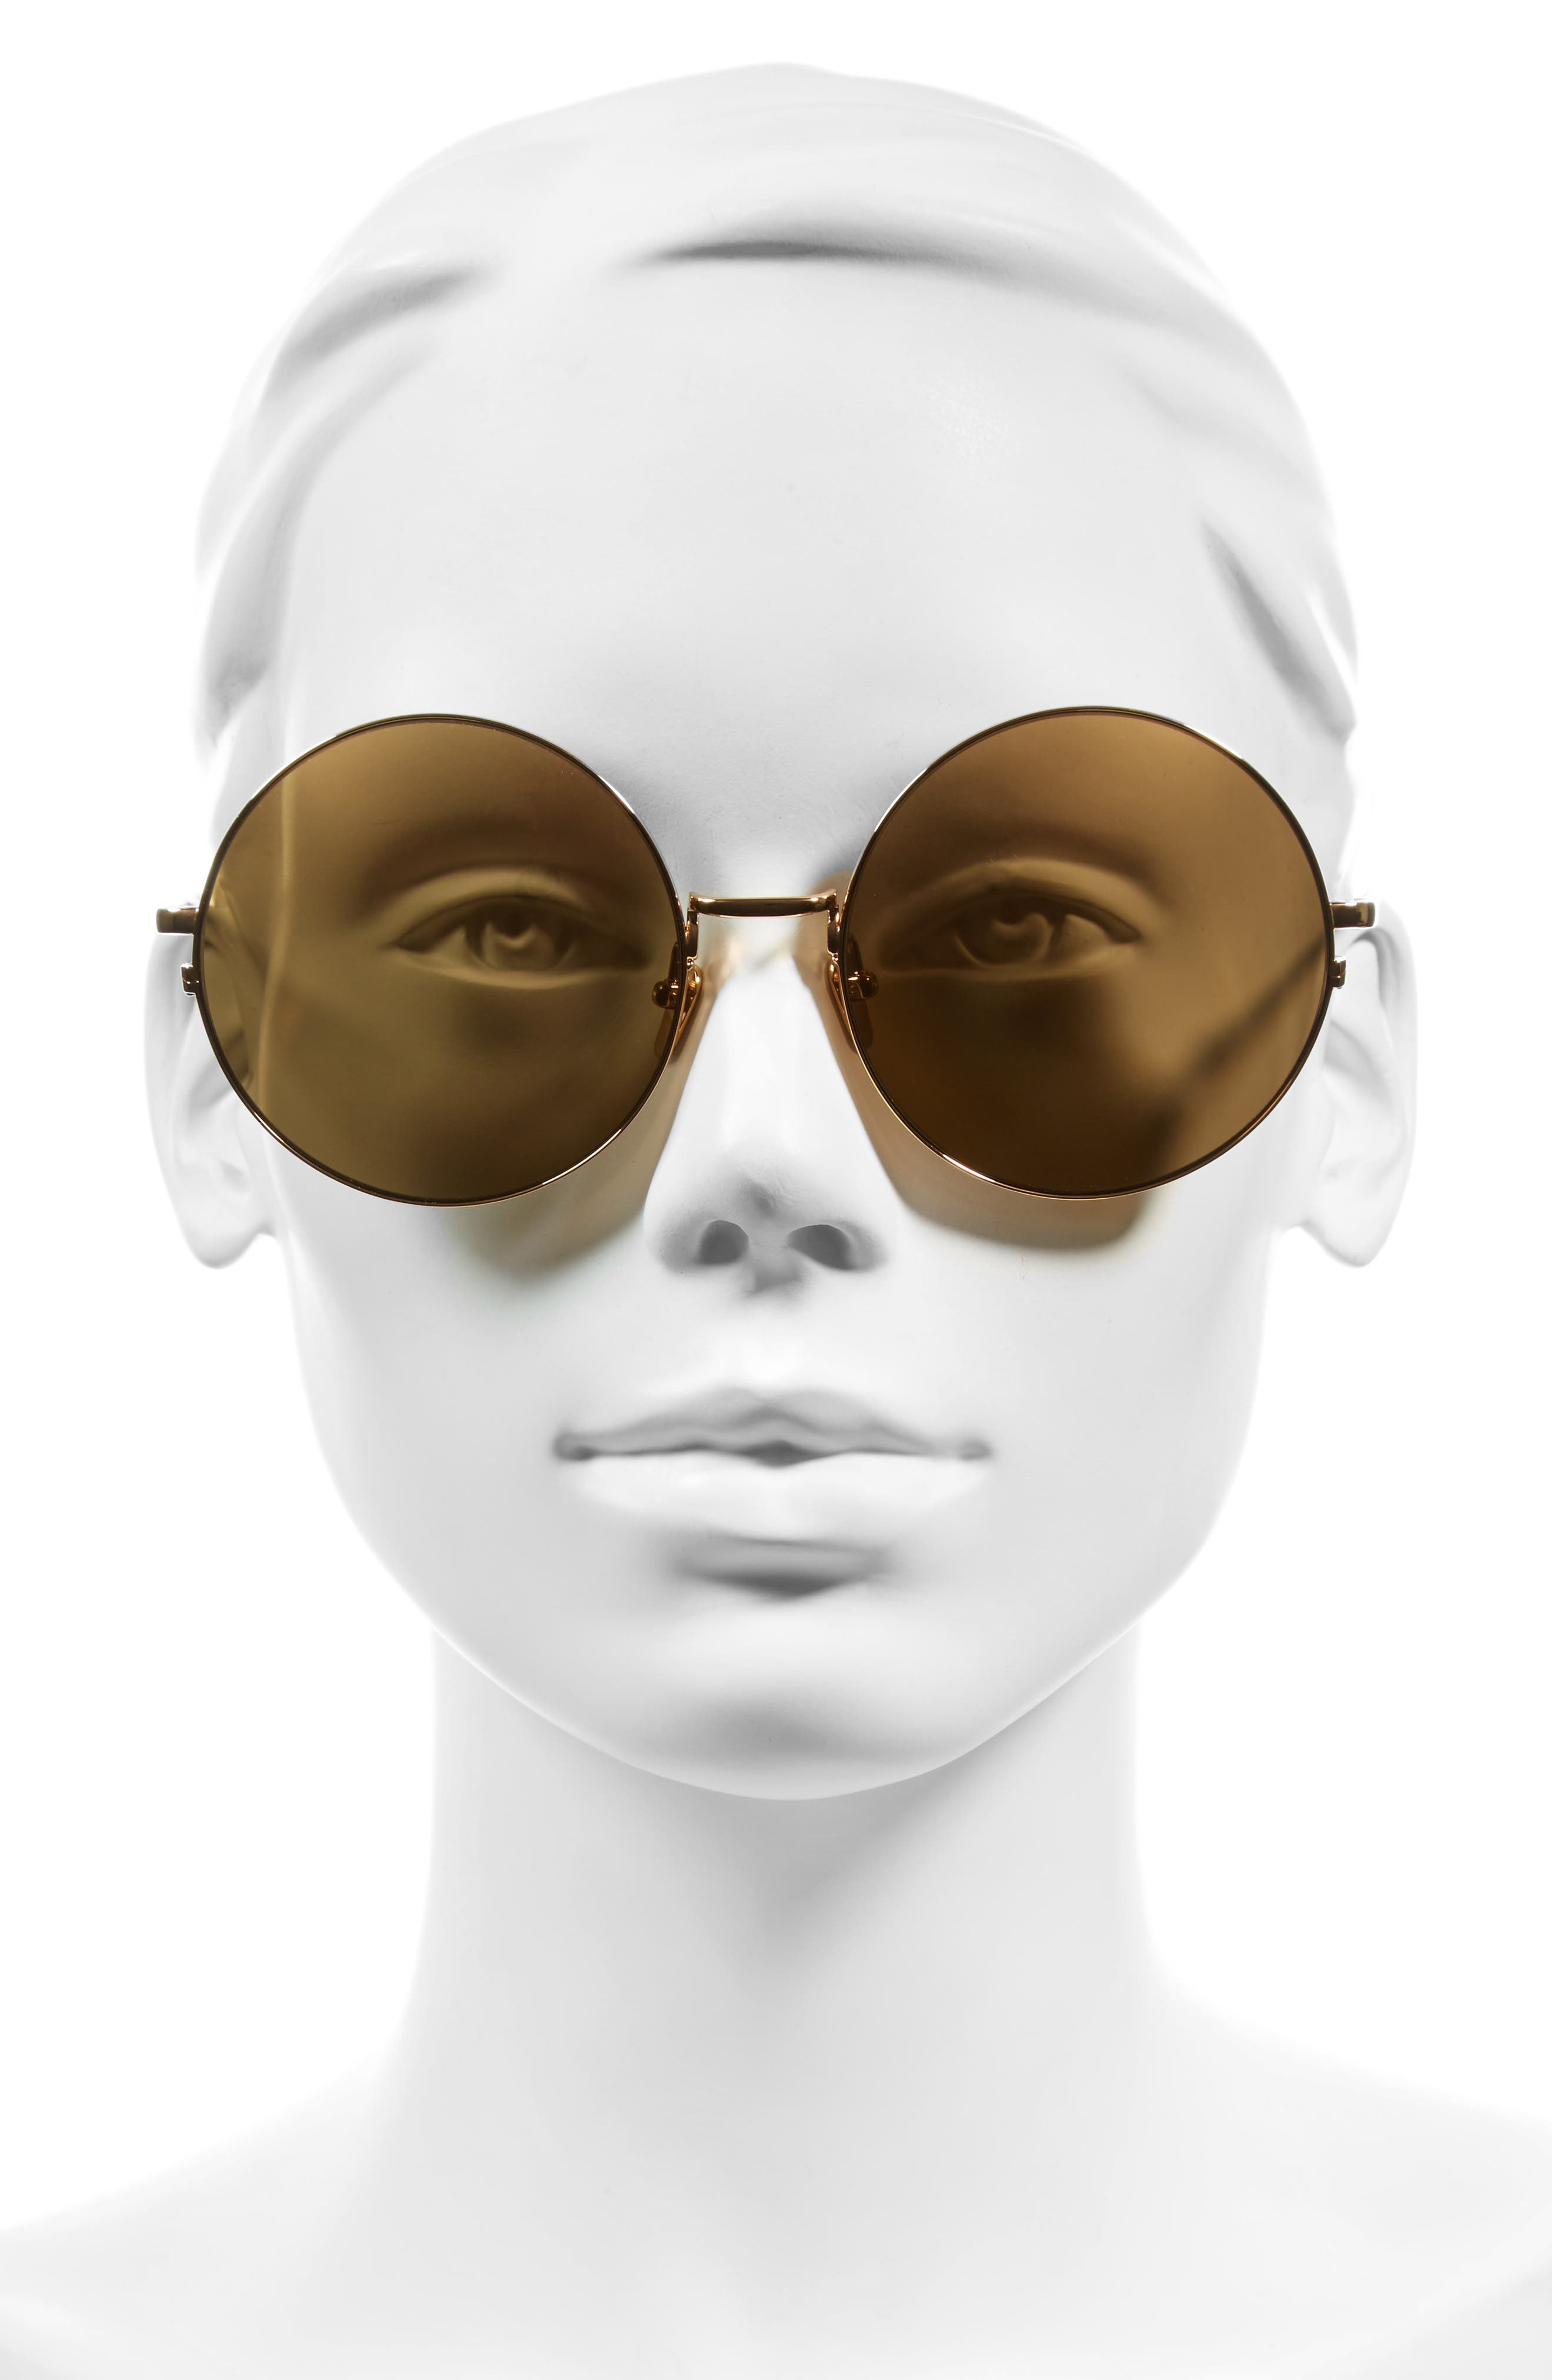 58mm 22 Karat Gold Trim Sunglasses,                             Alternate thumbnail 2, color,                             710